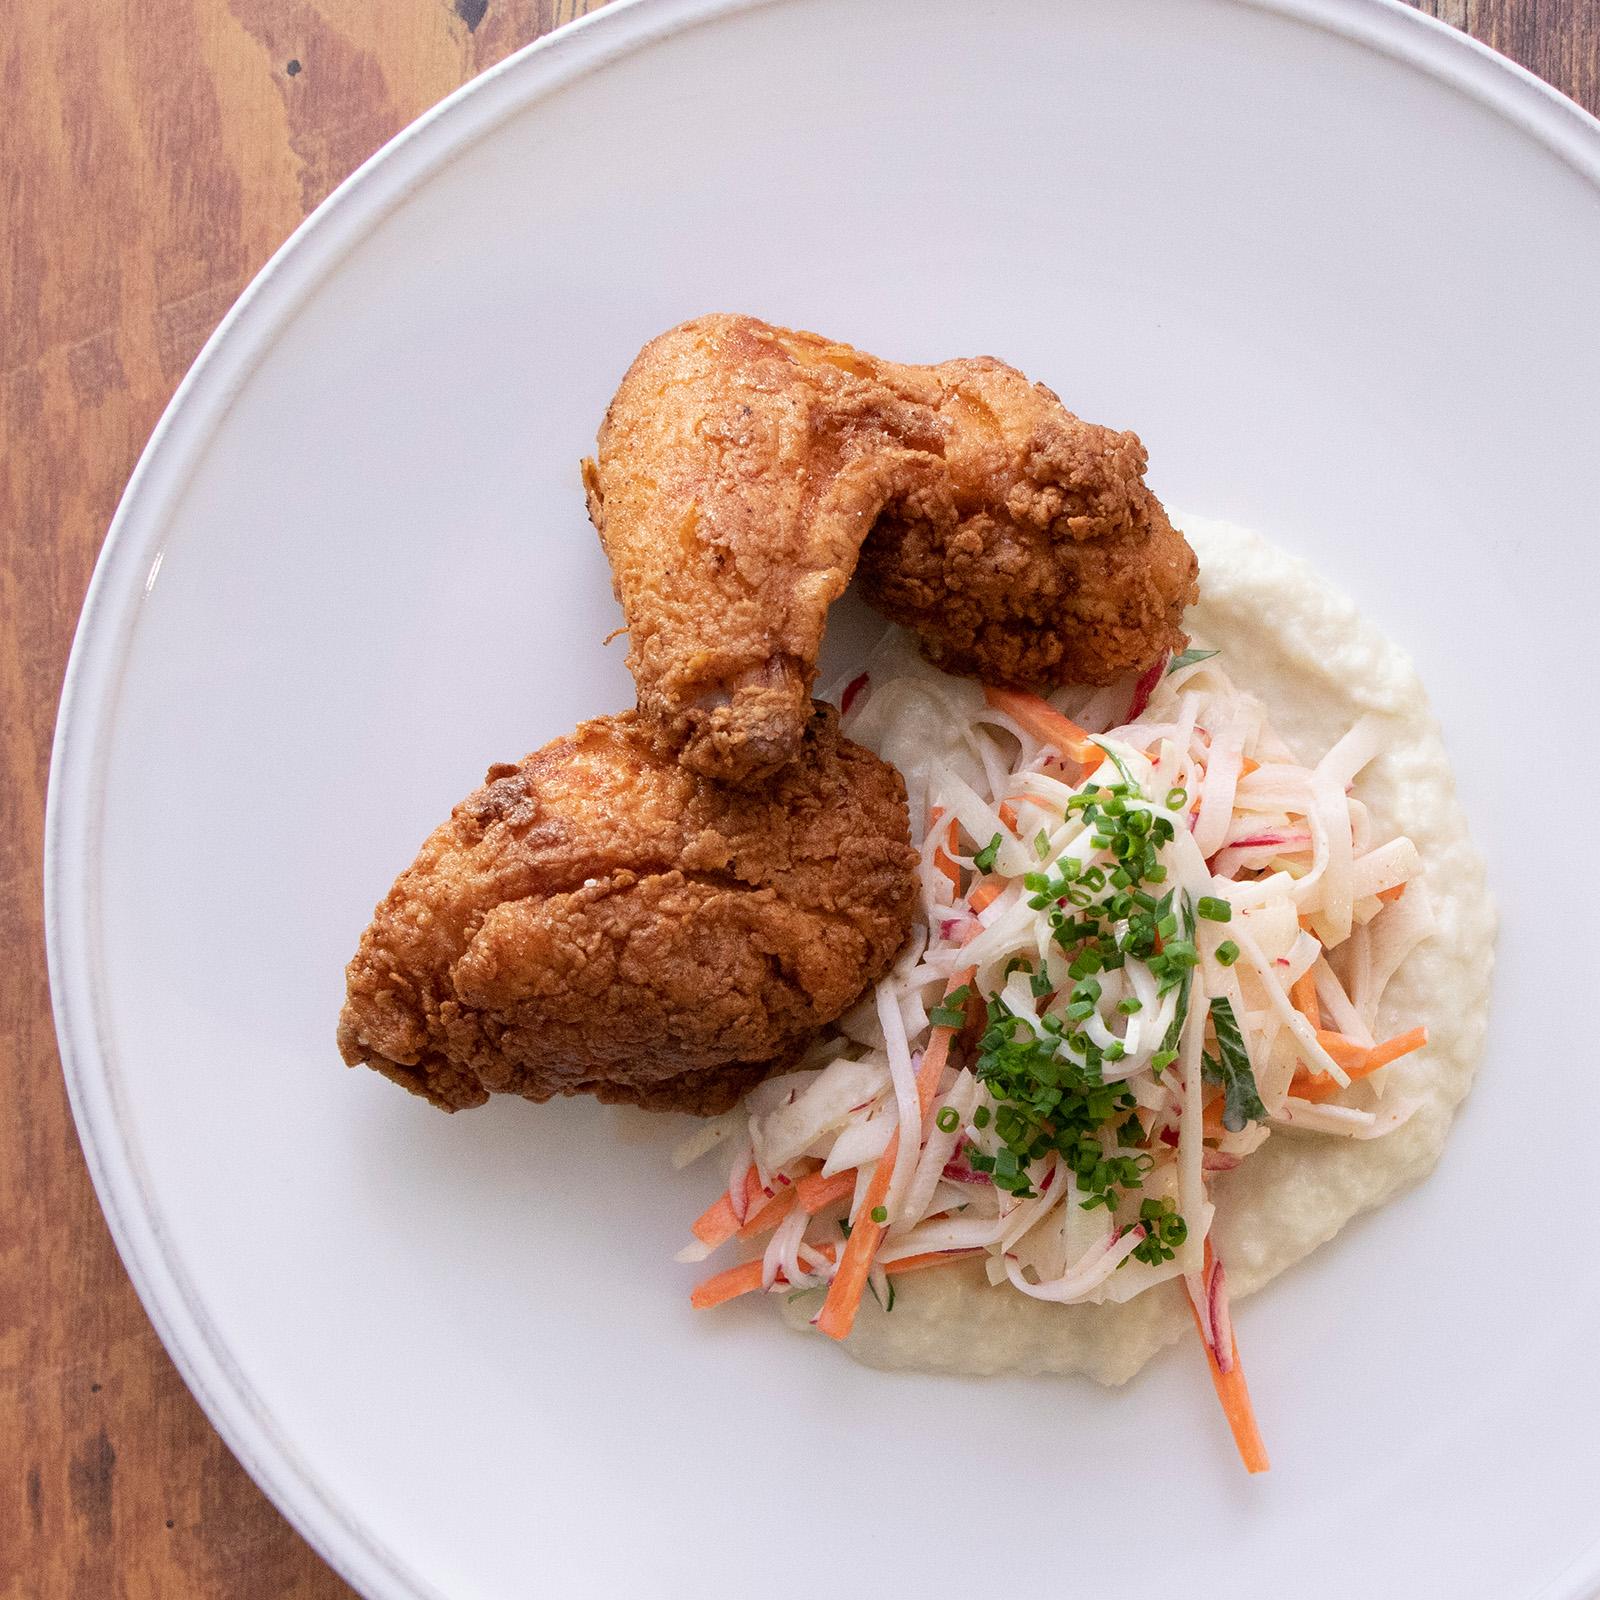 Honey Buttermilk Fried Chicken With Kohlrabi Slaw & Mashed Cauliflower